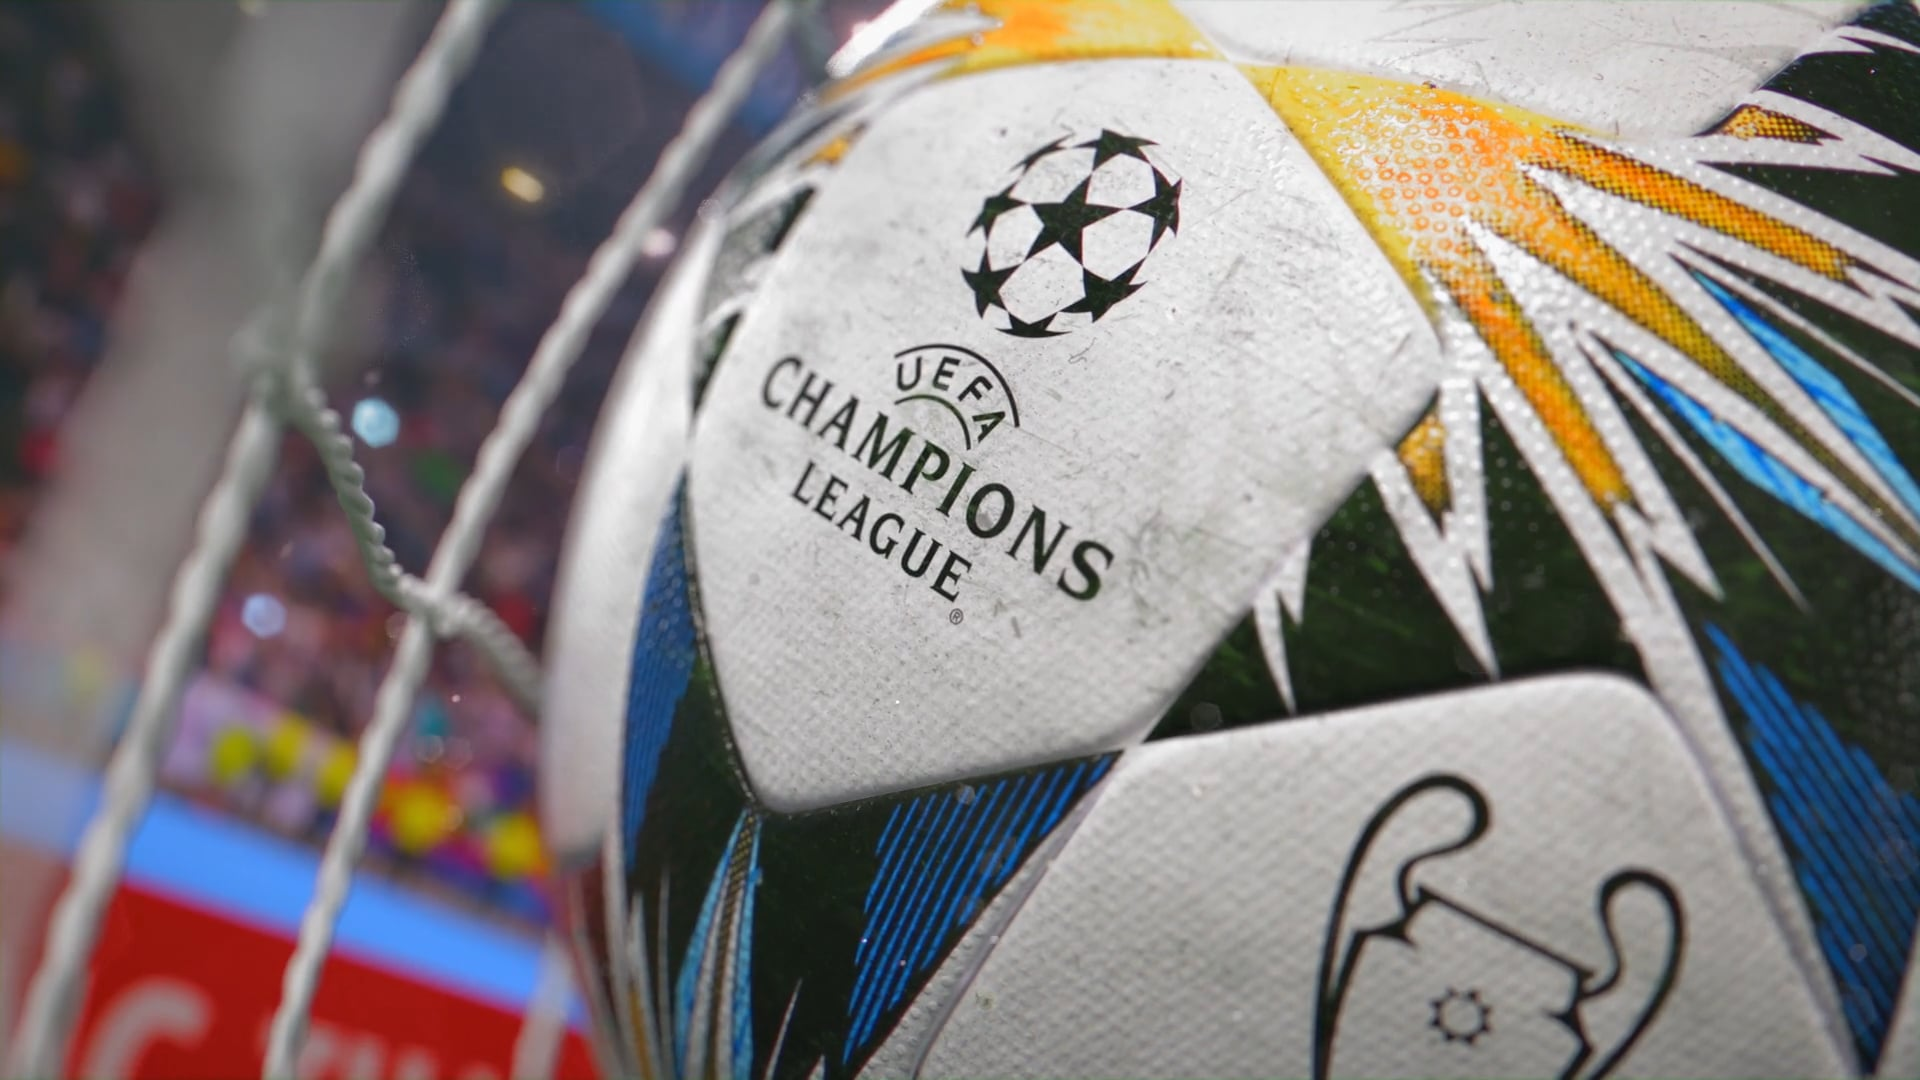 Sky 4K HDR- Uefa Champions League